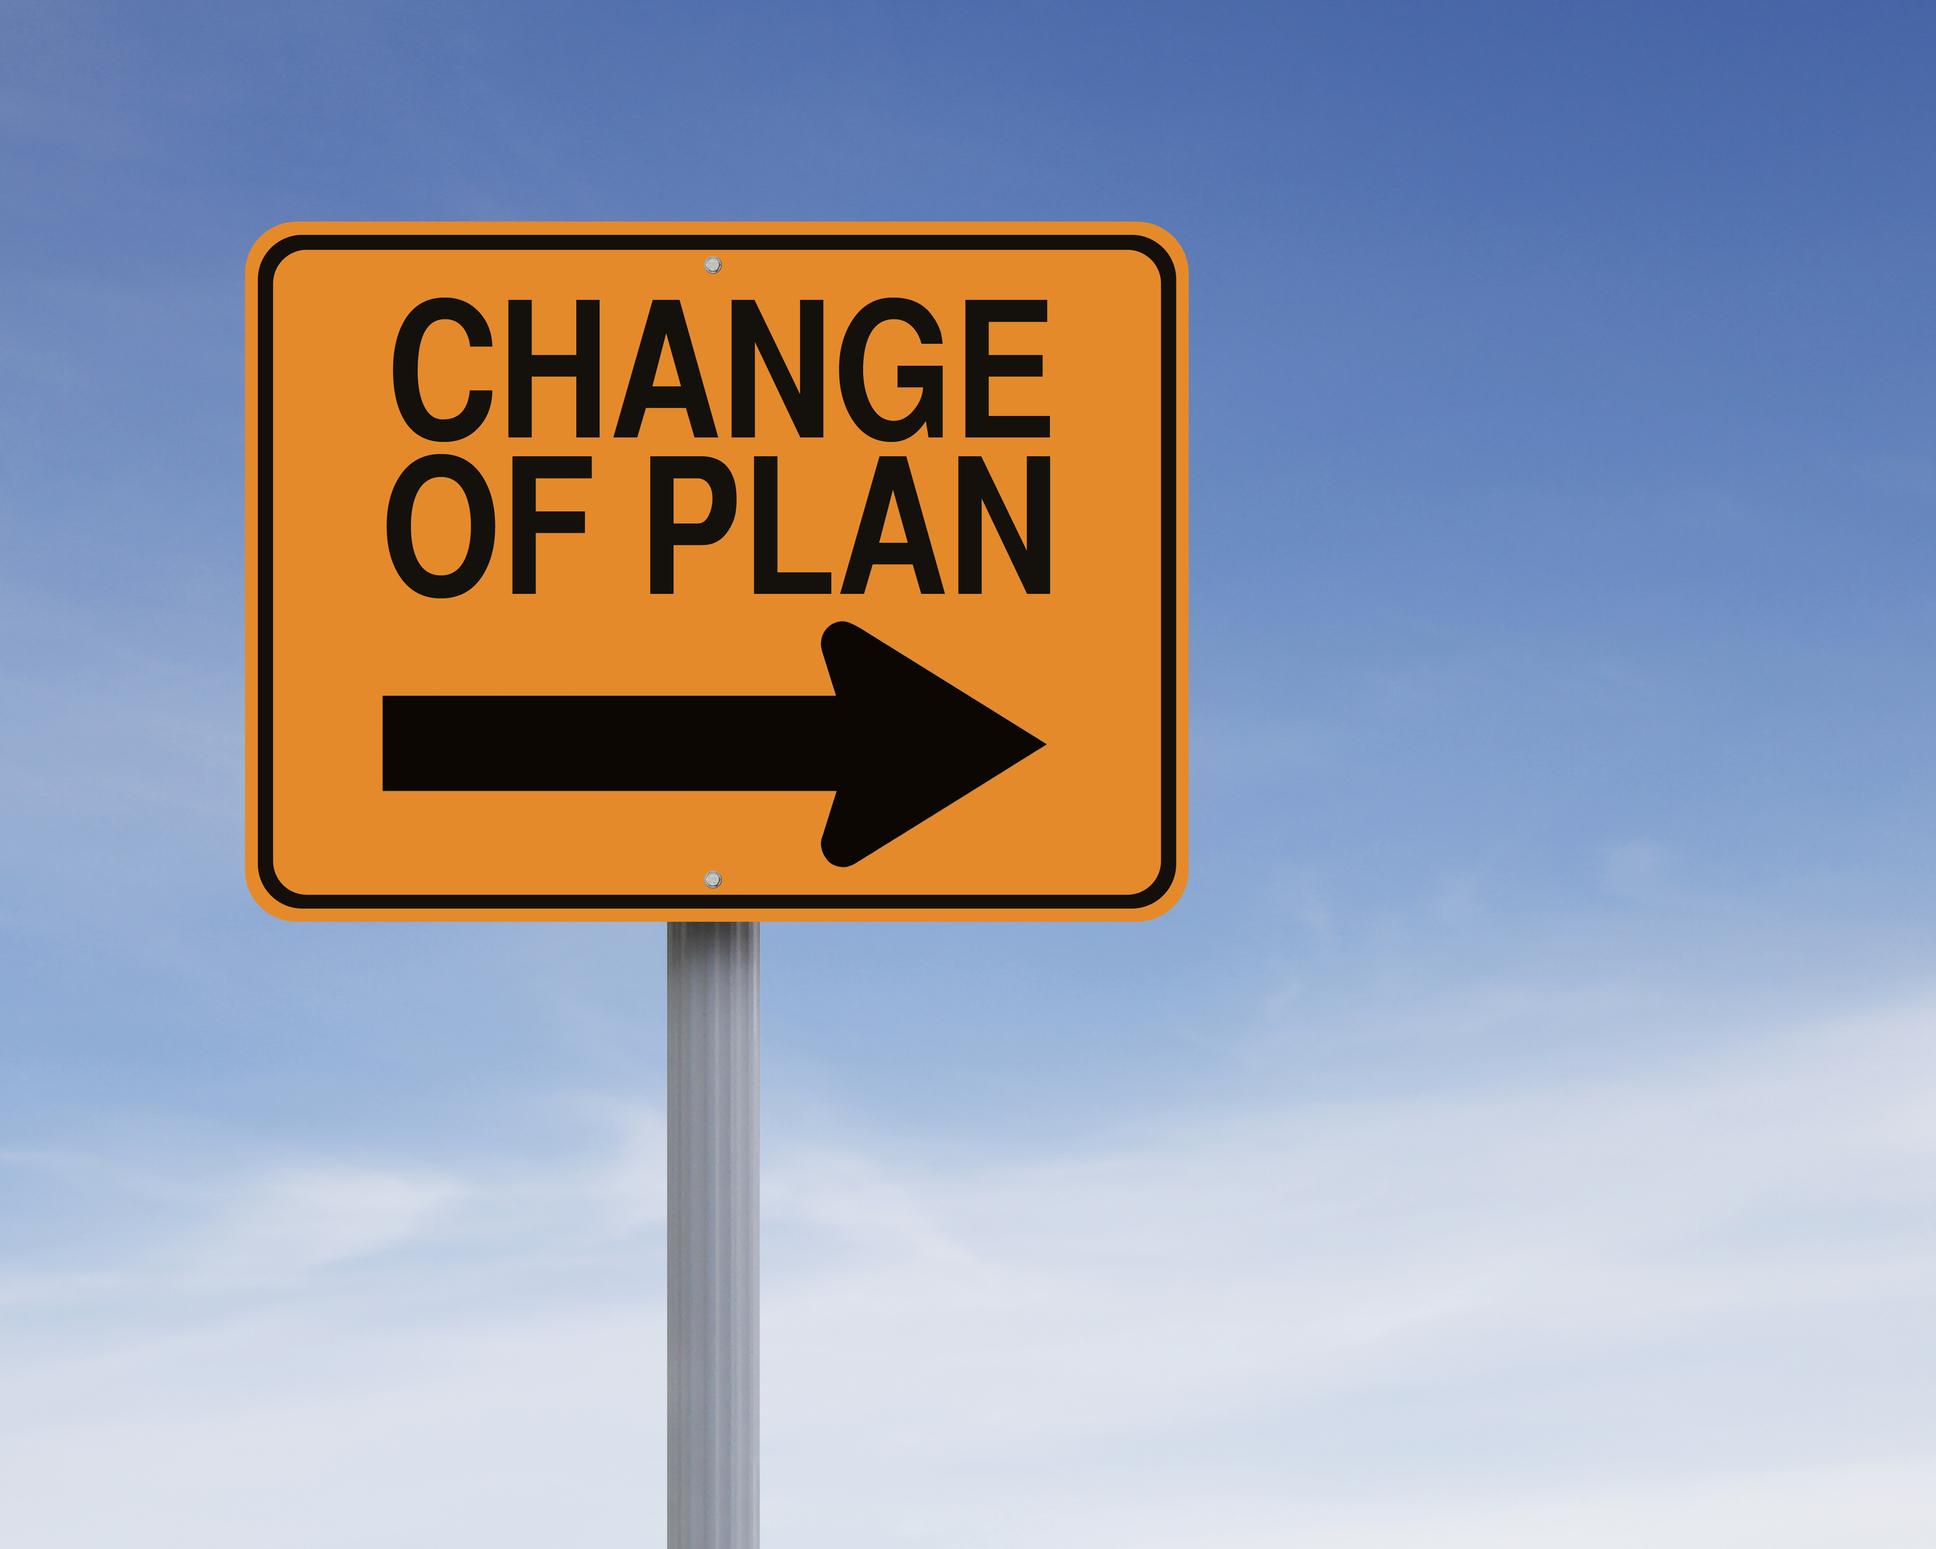 Change of plan sign.